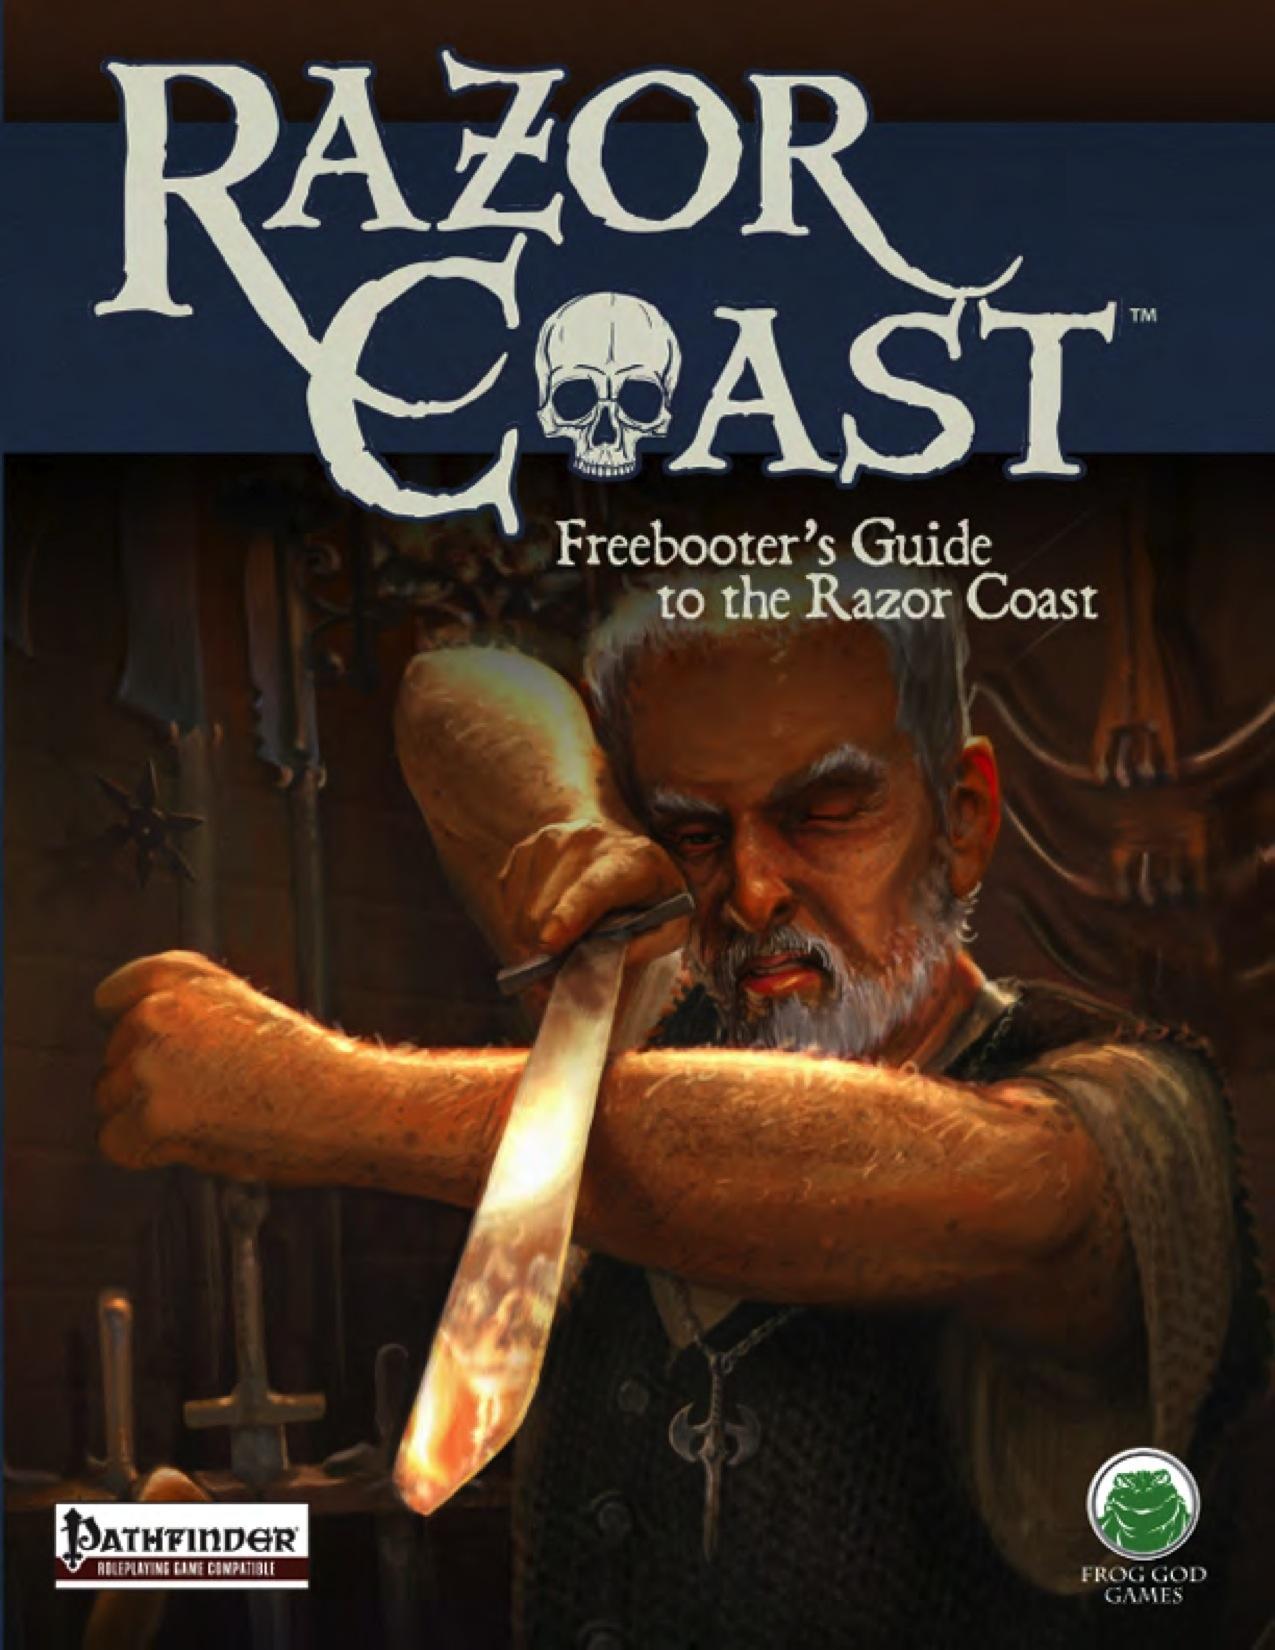 razor coast - freebooters guide